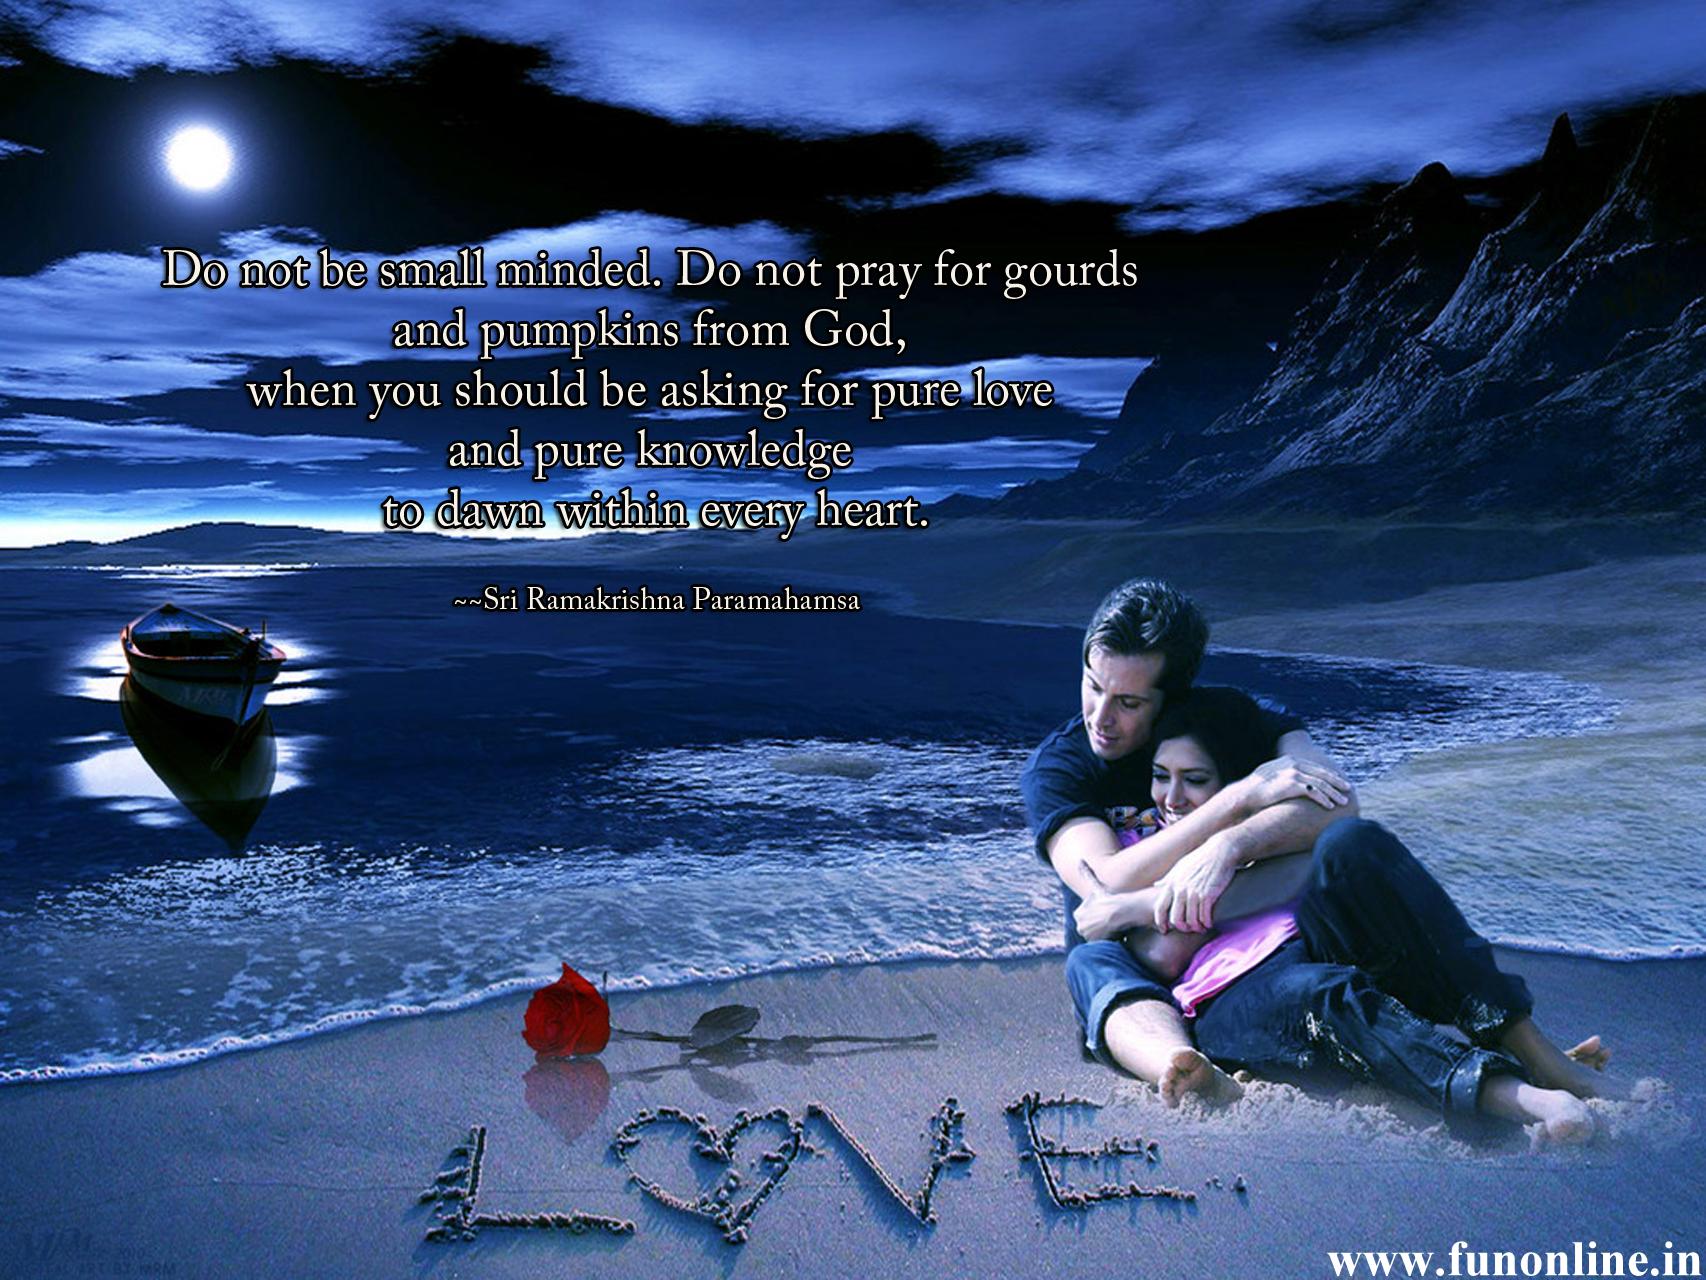 Romantic Love Wallpapers Download Romantic Love HD Wallpapers 1706x1280